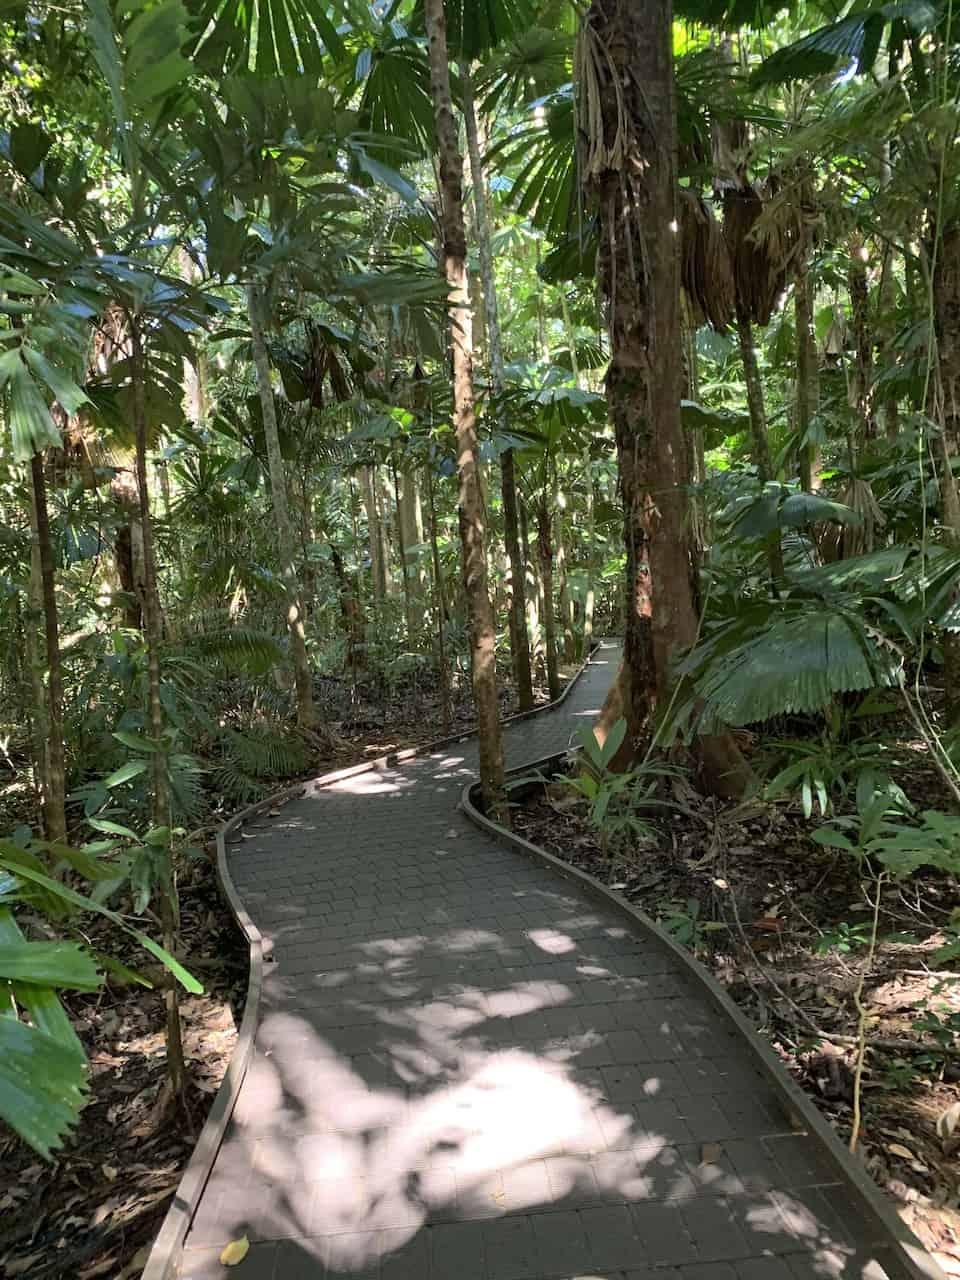 Daintree Rainforest Trees